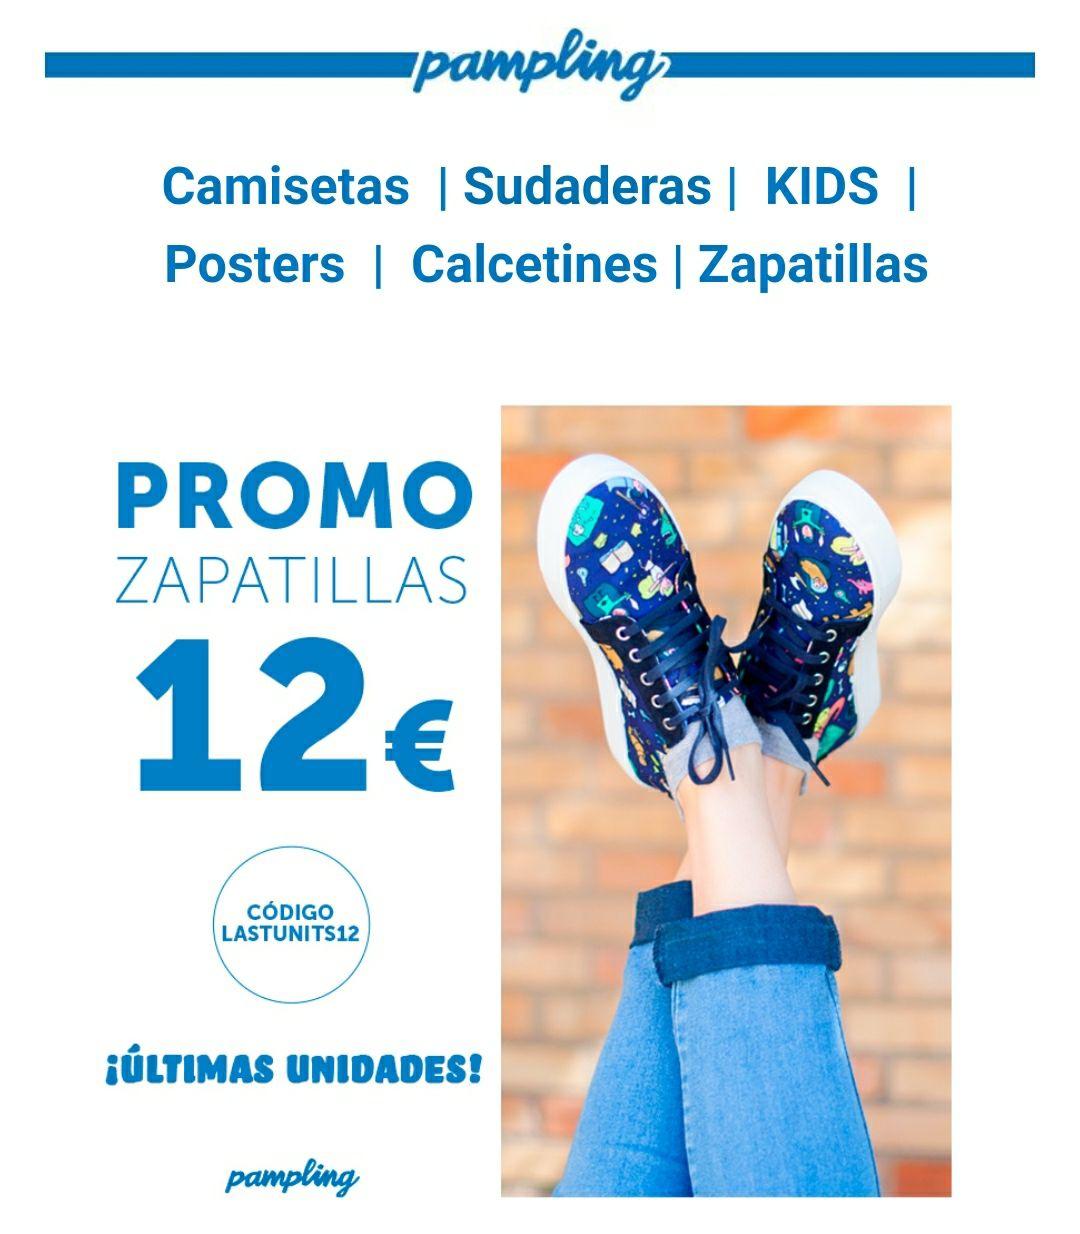 Zapatillas Pampling